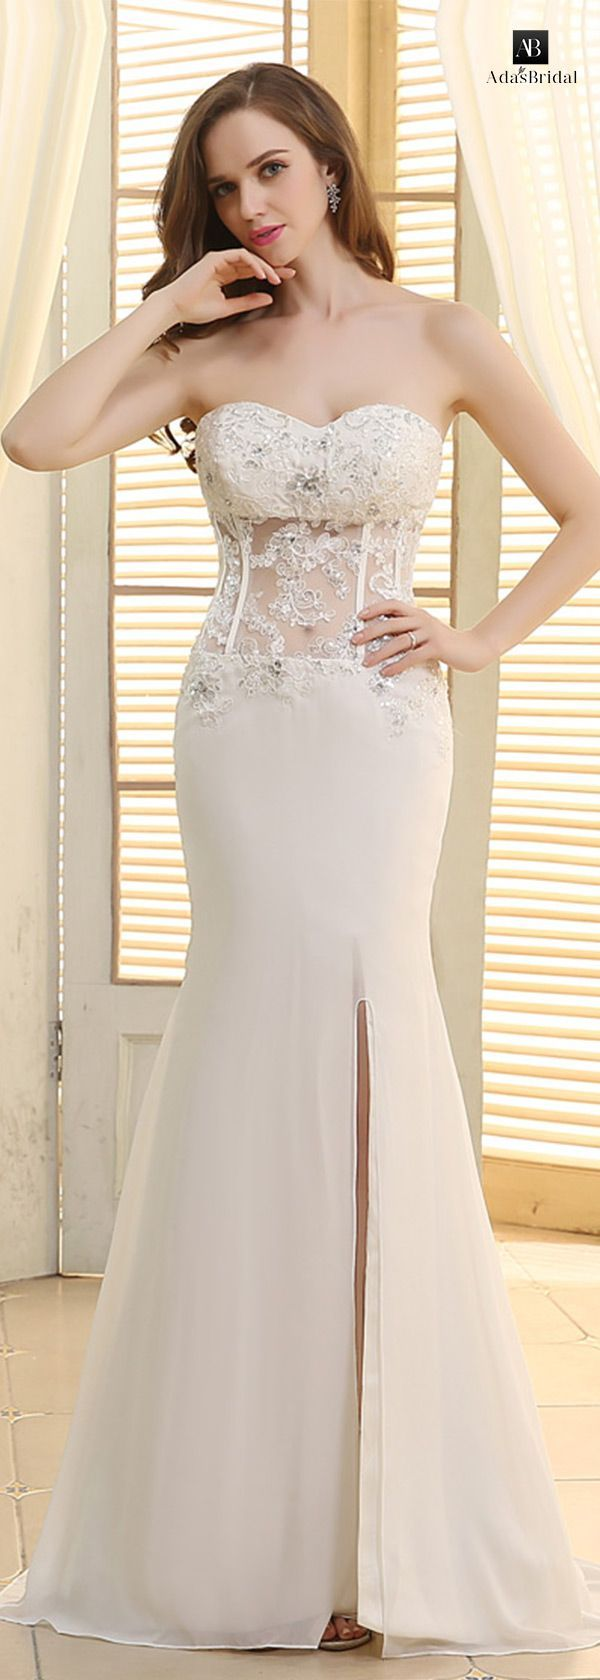 Mermaid wedding dresses amazing chiffon sweetheart neckline see